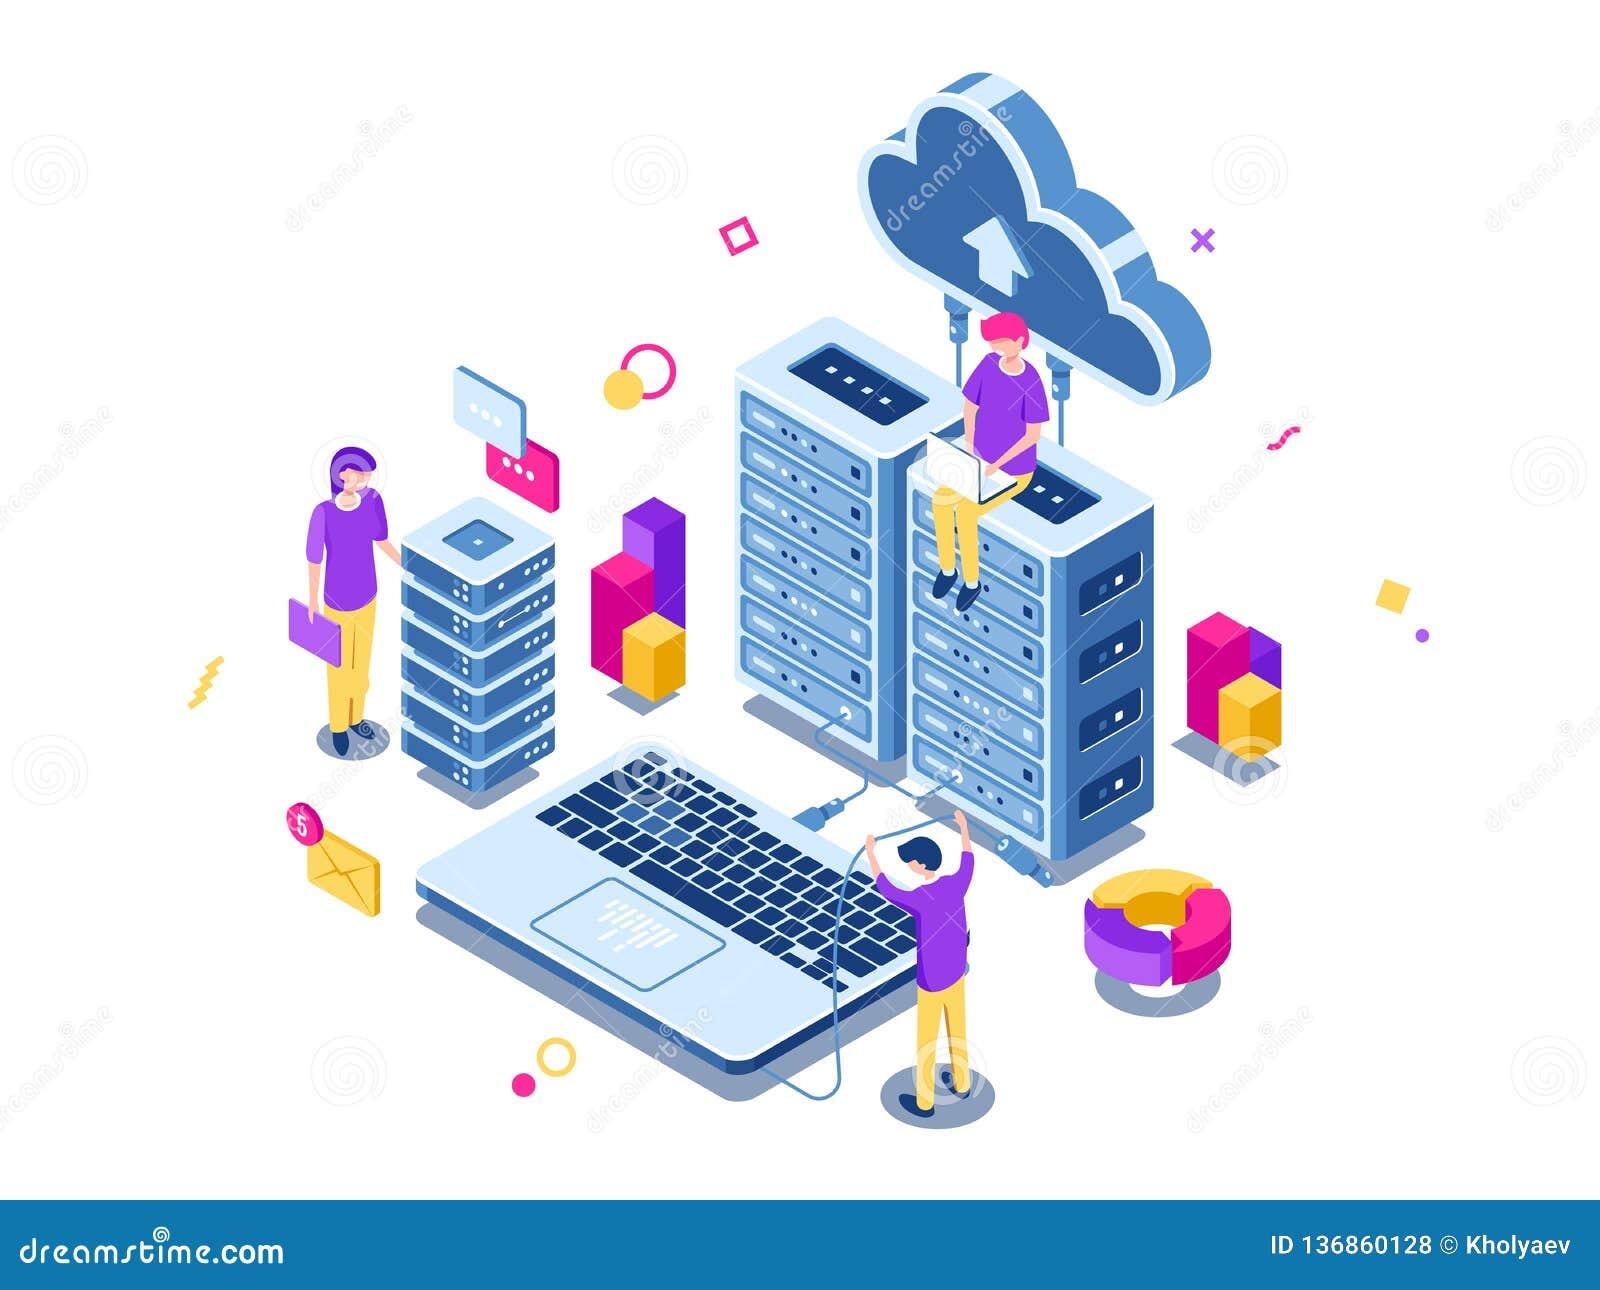 Big data center, server room rack, engineering process, teamwork, computer technology, cloud storage, command work